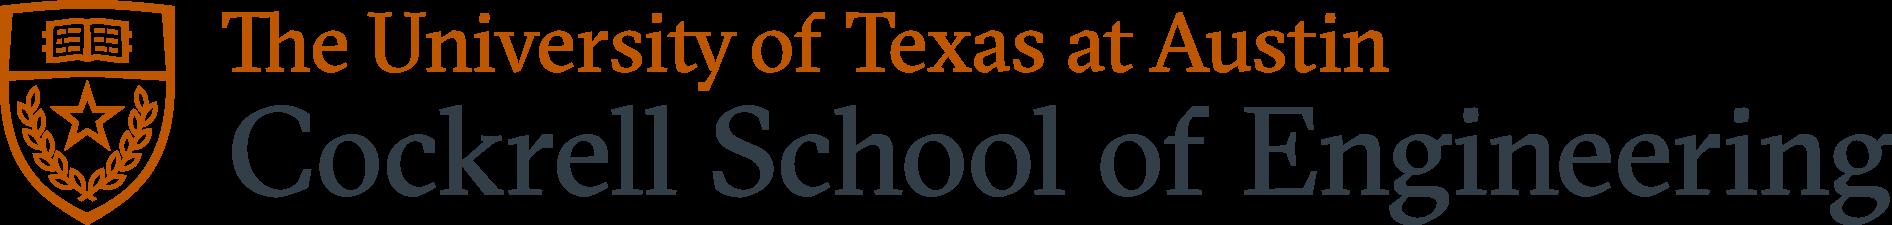 UT Austin Engineering Logo